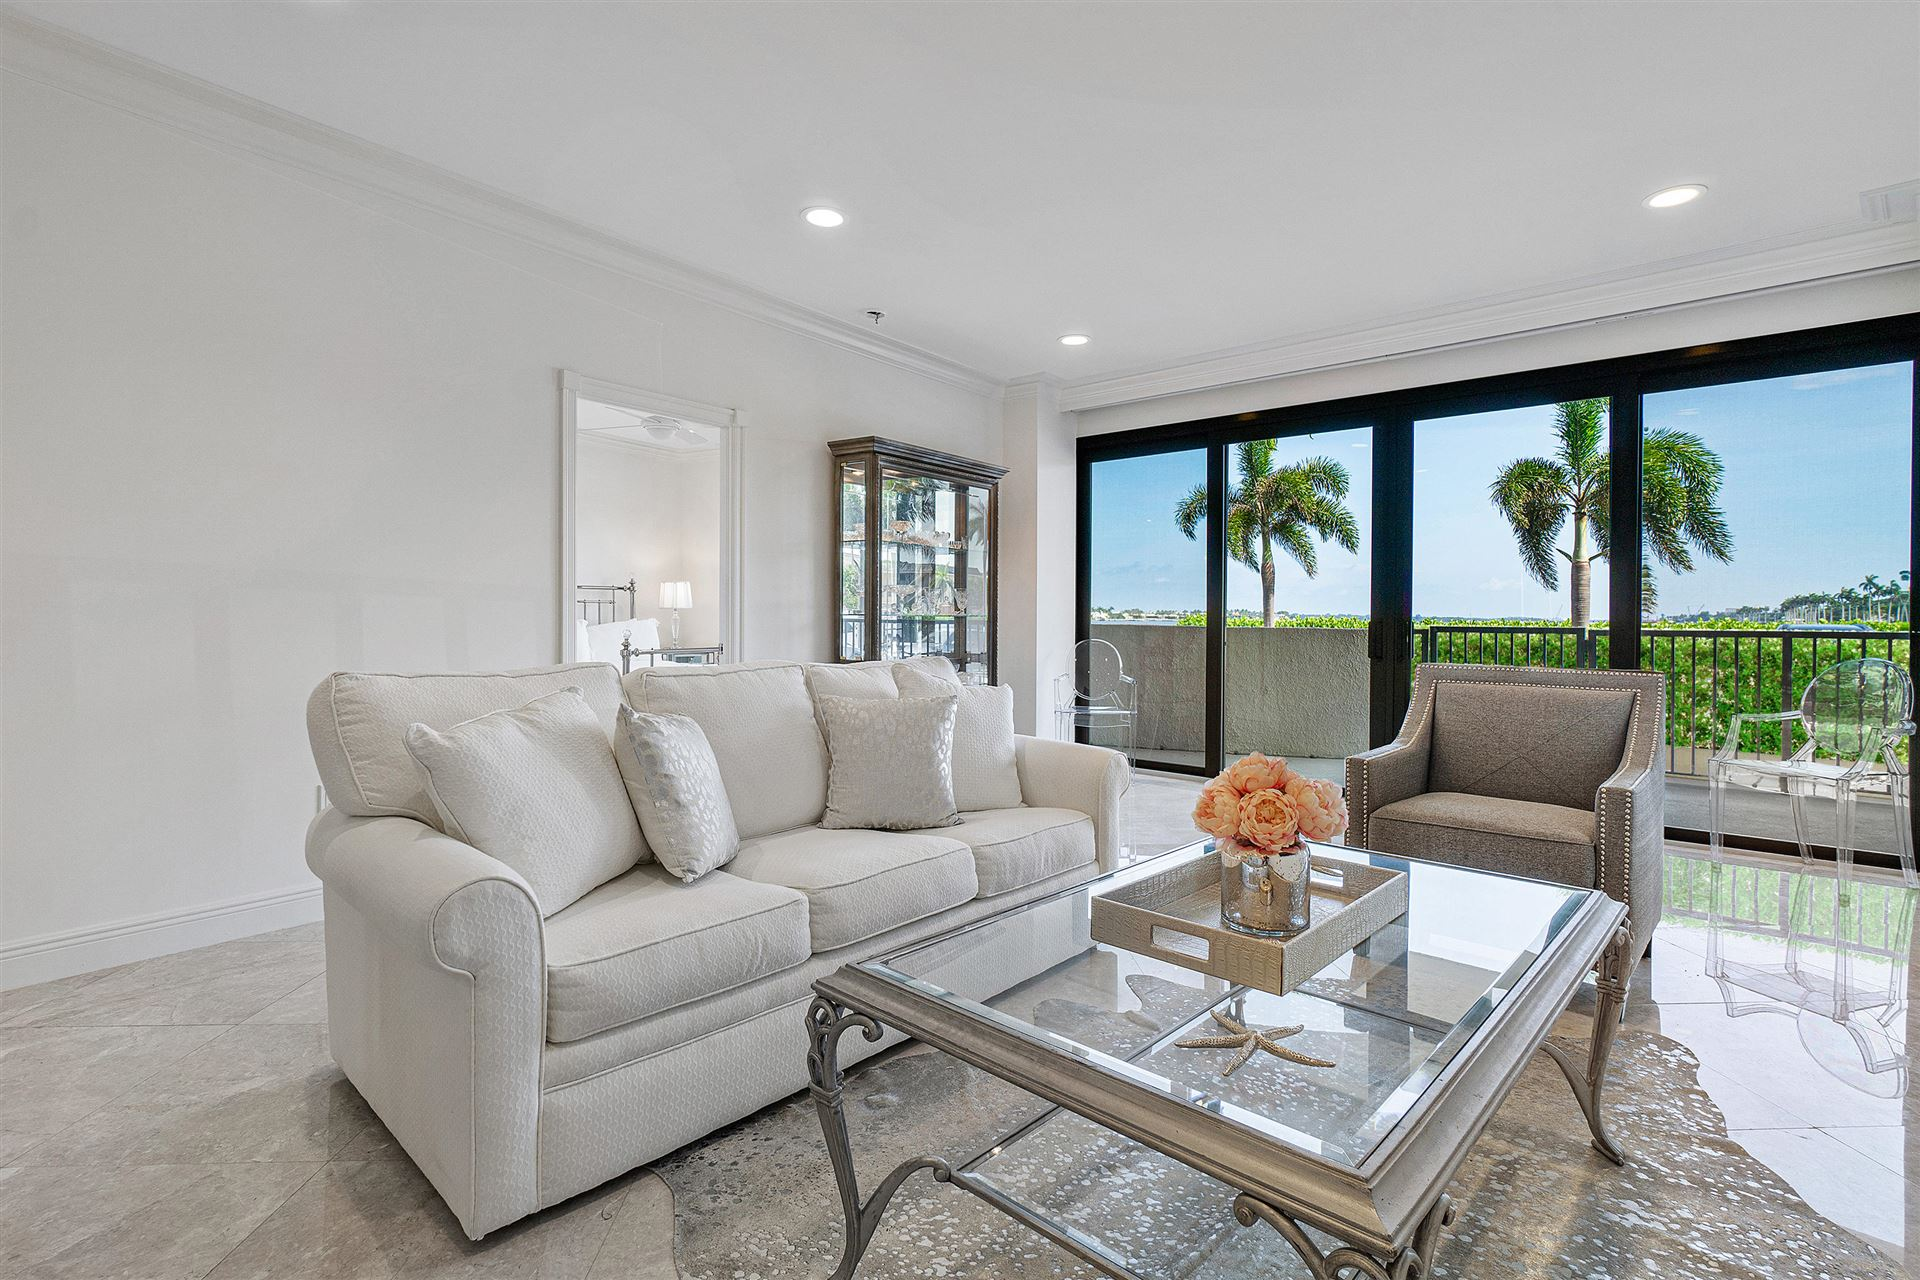 1200 S Flagler 105 Drive #105, West Palm Beach, FL 33401 - MLS#: RX-10630825